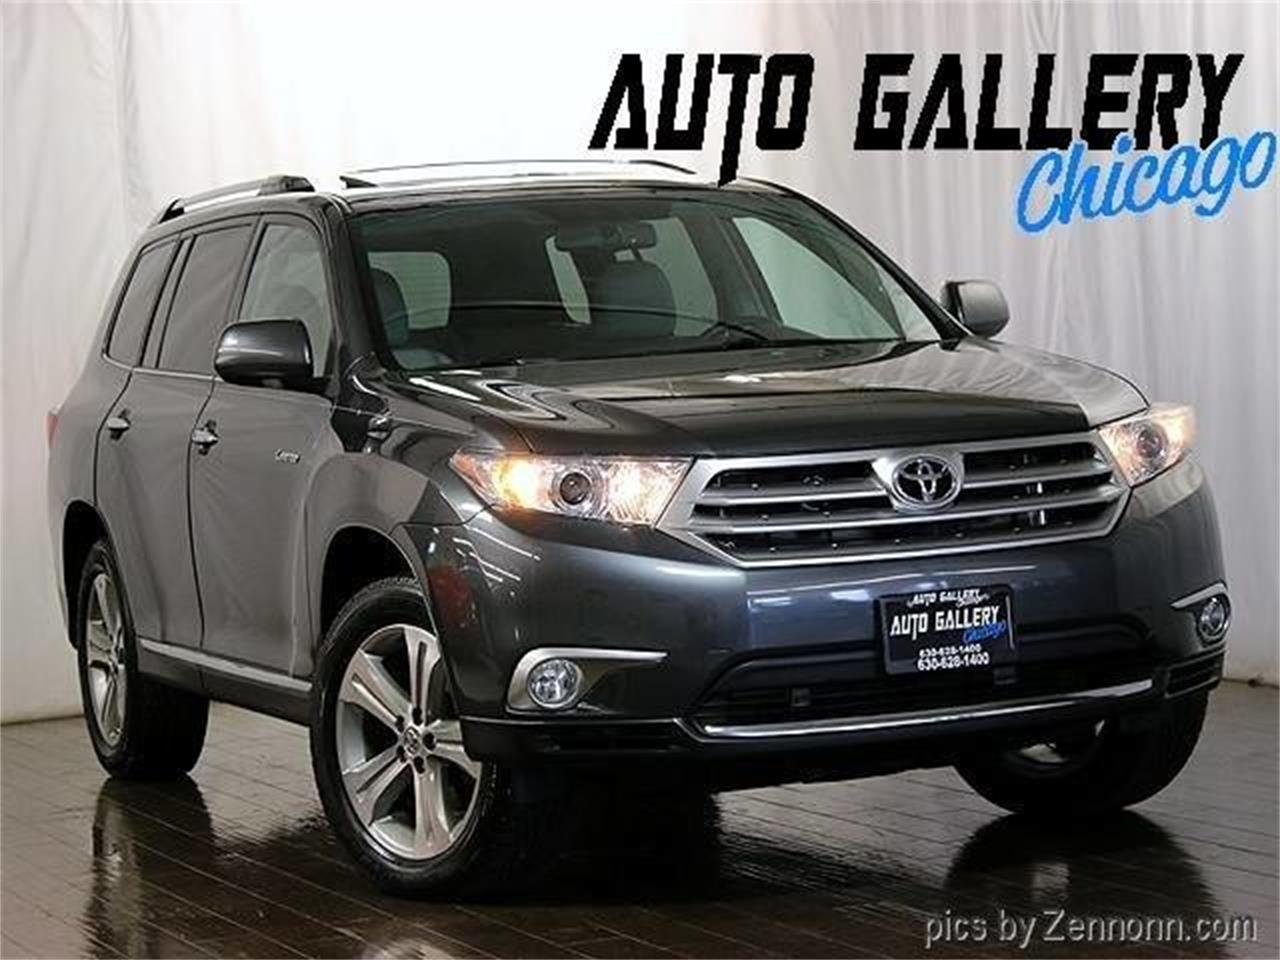 2012 Toyota Highlander For Sale >> For Sale 2012 Toyota Highlander In Addison Illinois